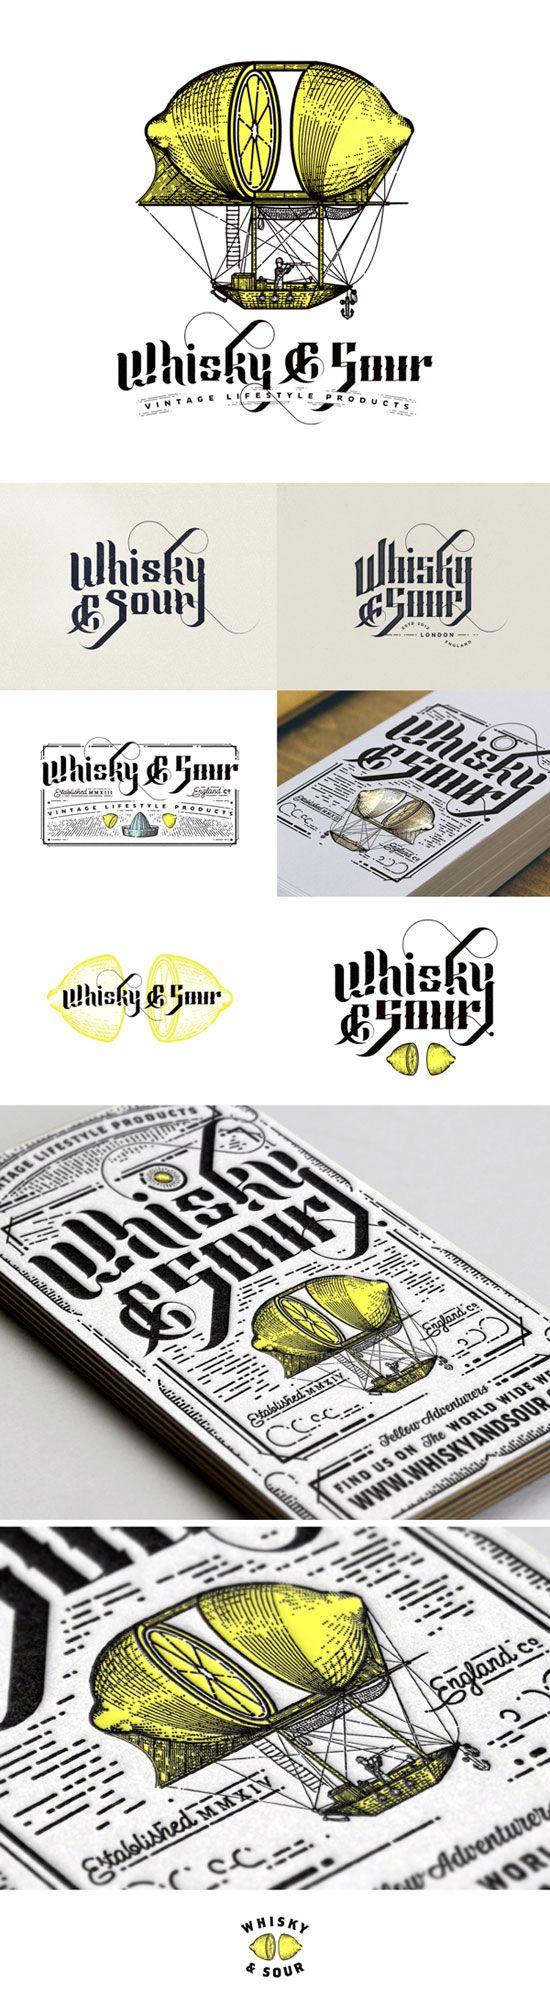 Beautiful and Very Details Logo Designs by Joe White|iBrandStudio